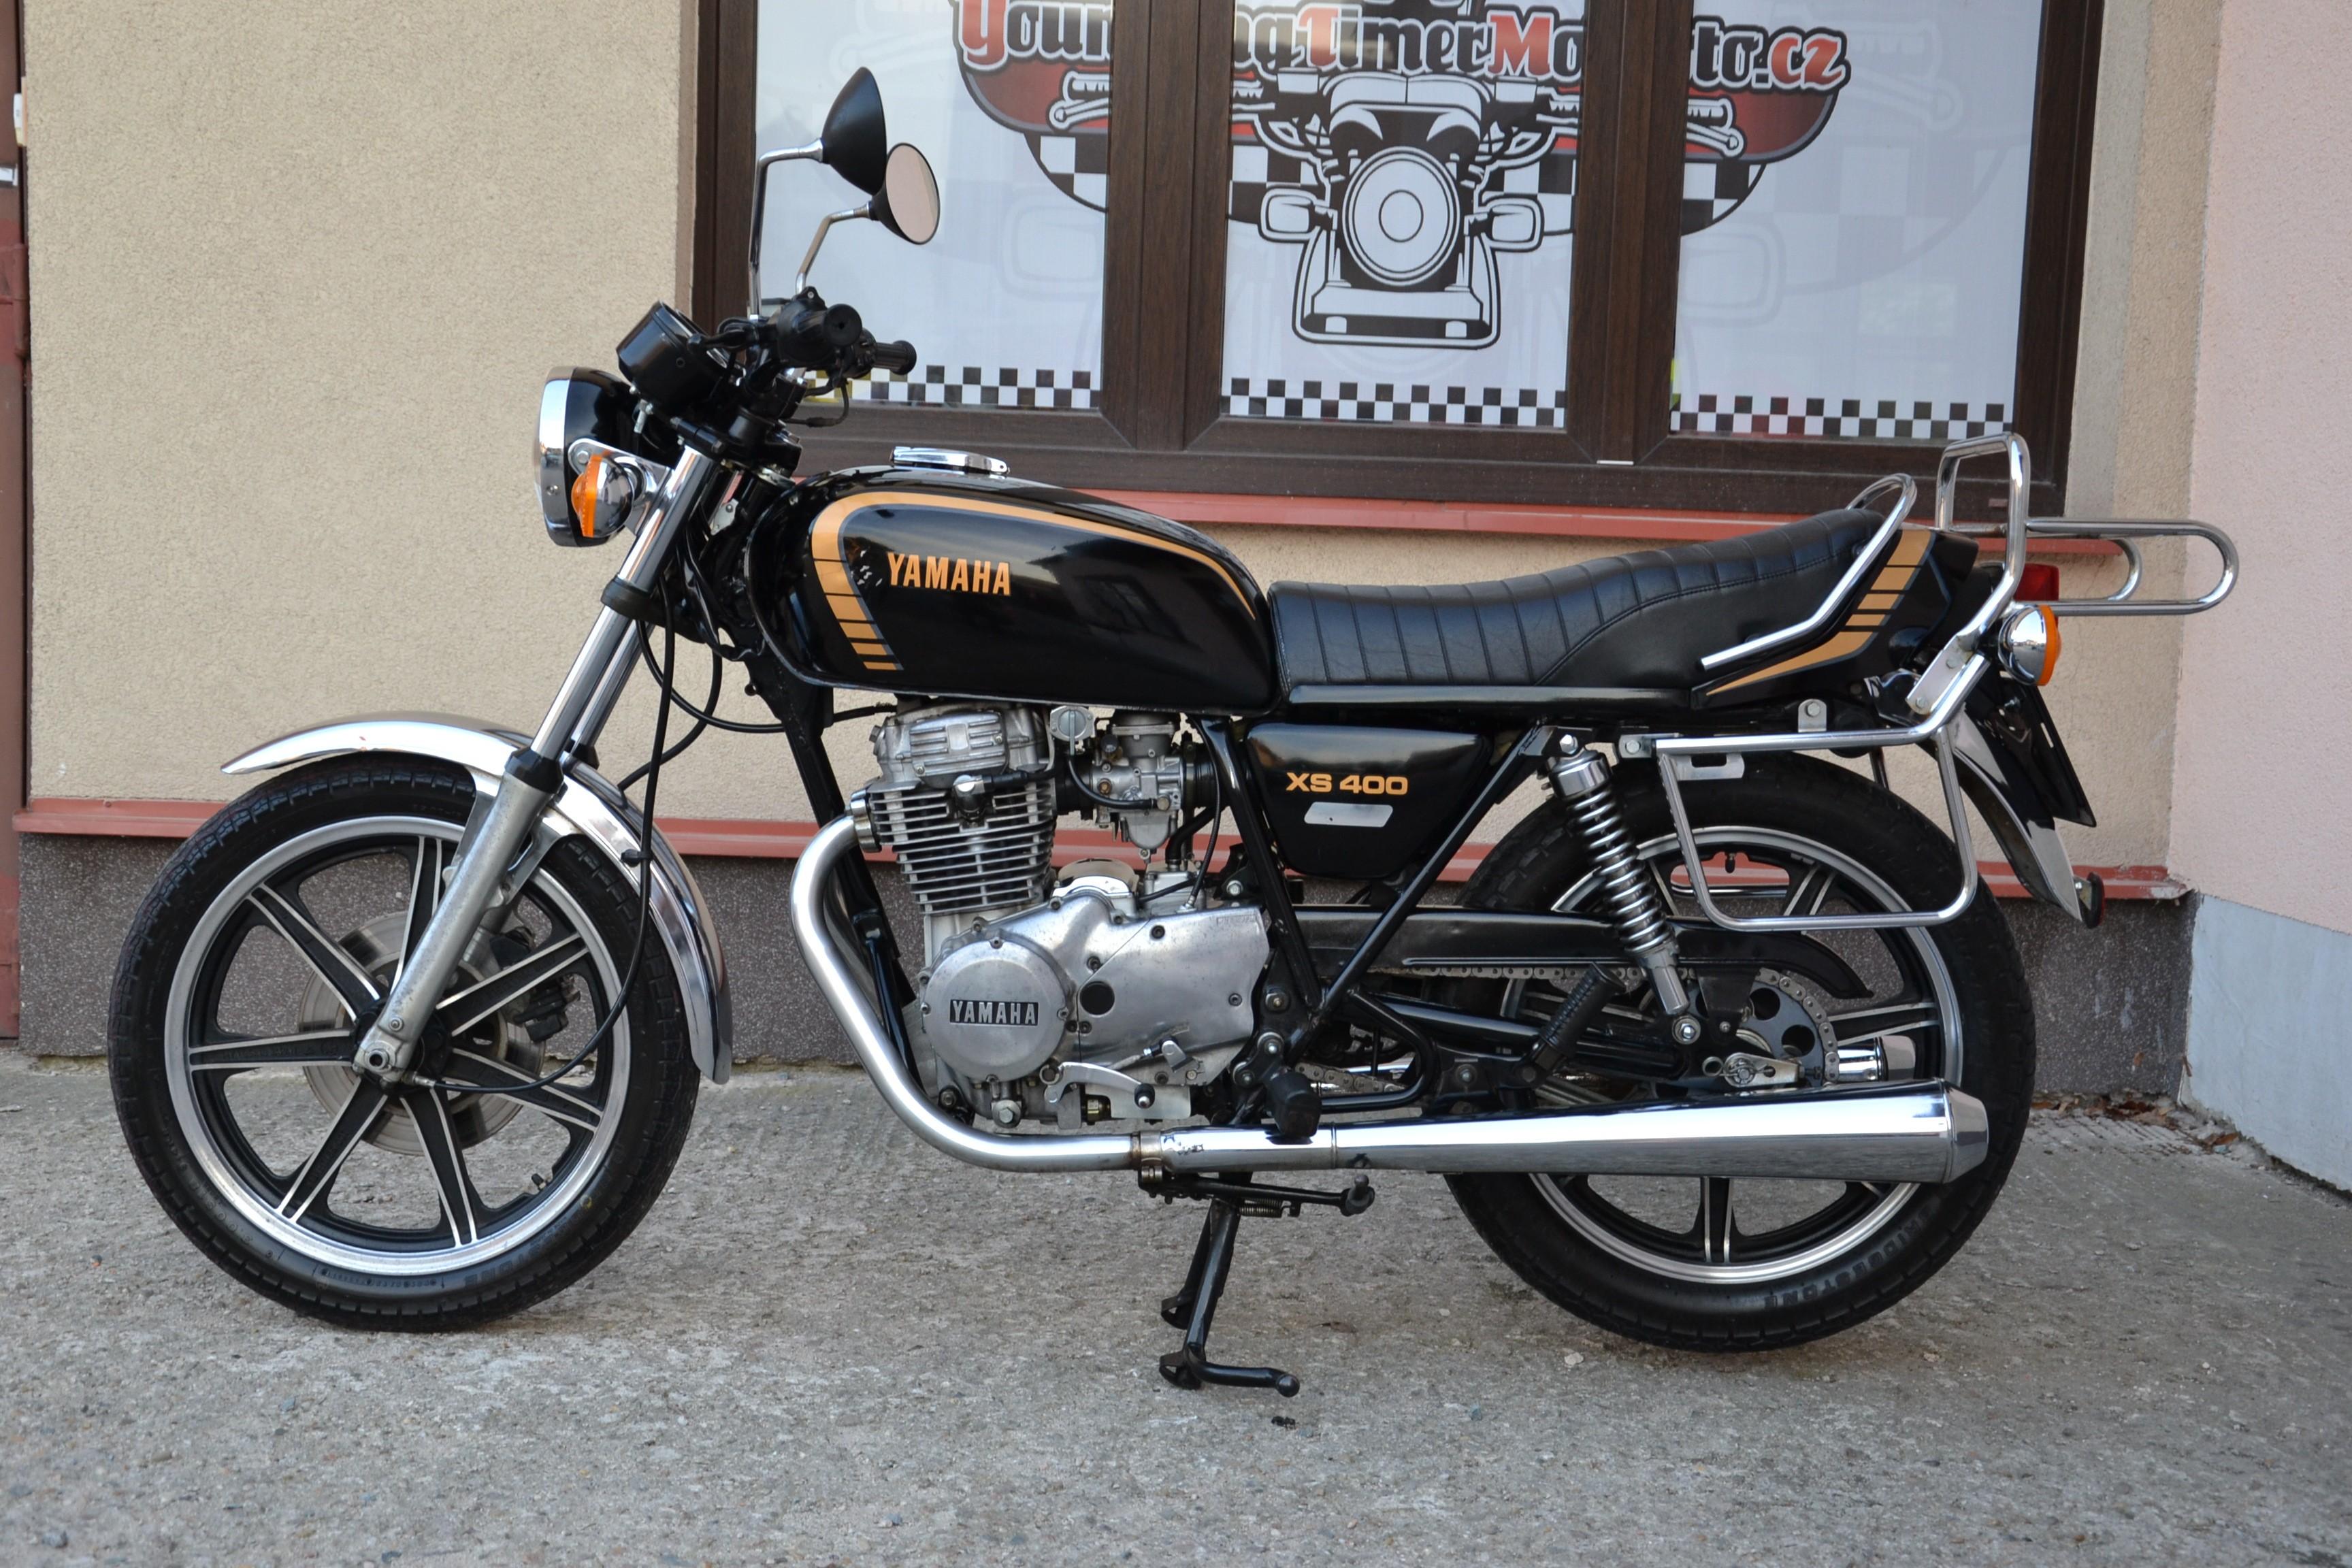 yamaha xs 400 dovoz prodej v kup novodob ch moto motocyklov ch klasik. Black Bedroom Furniture Sets. Home Design Ideas